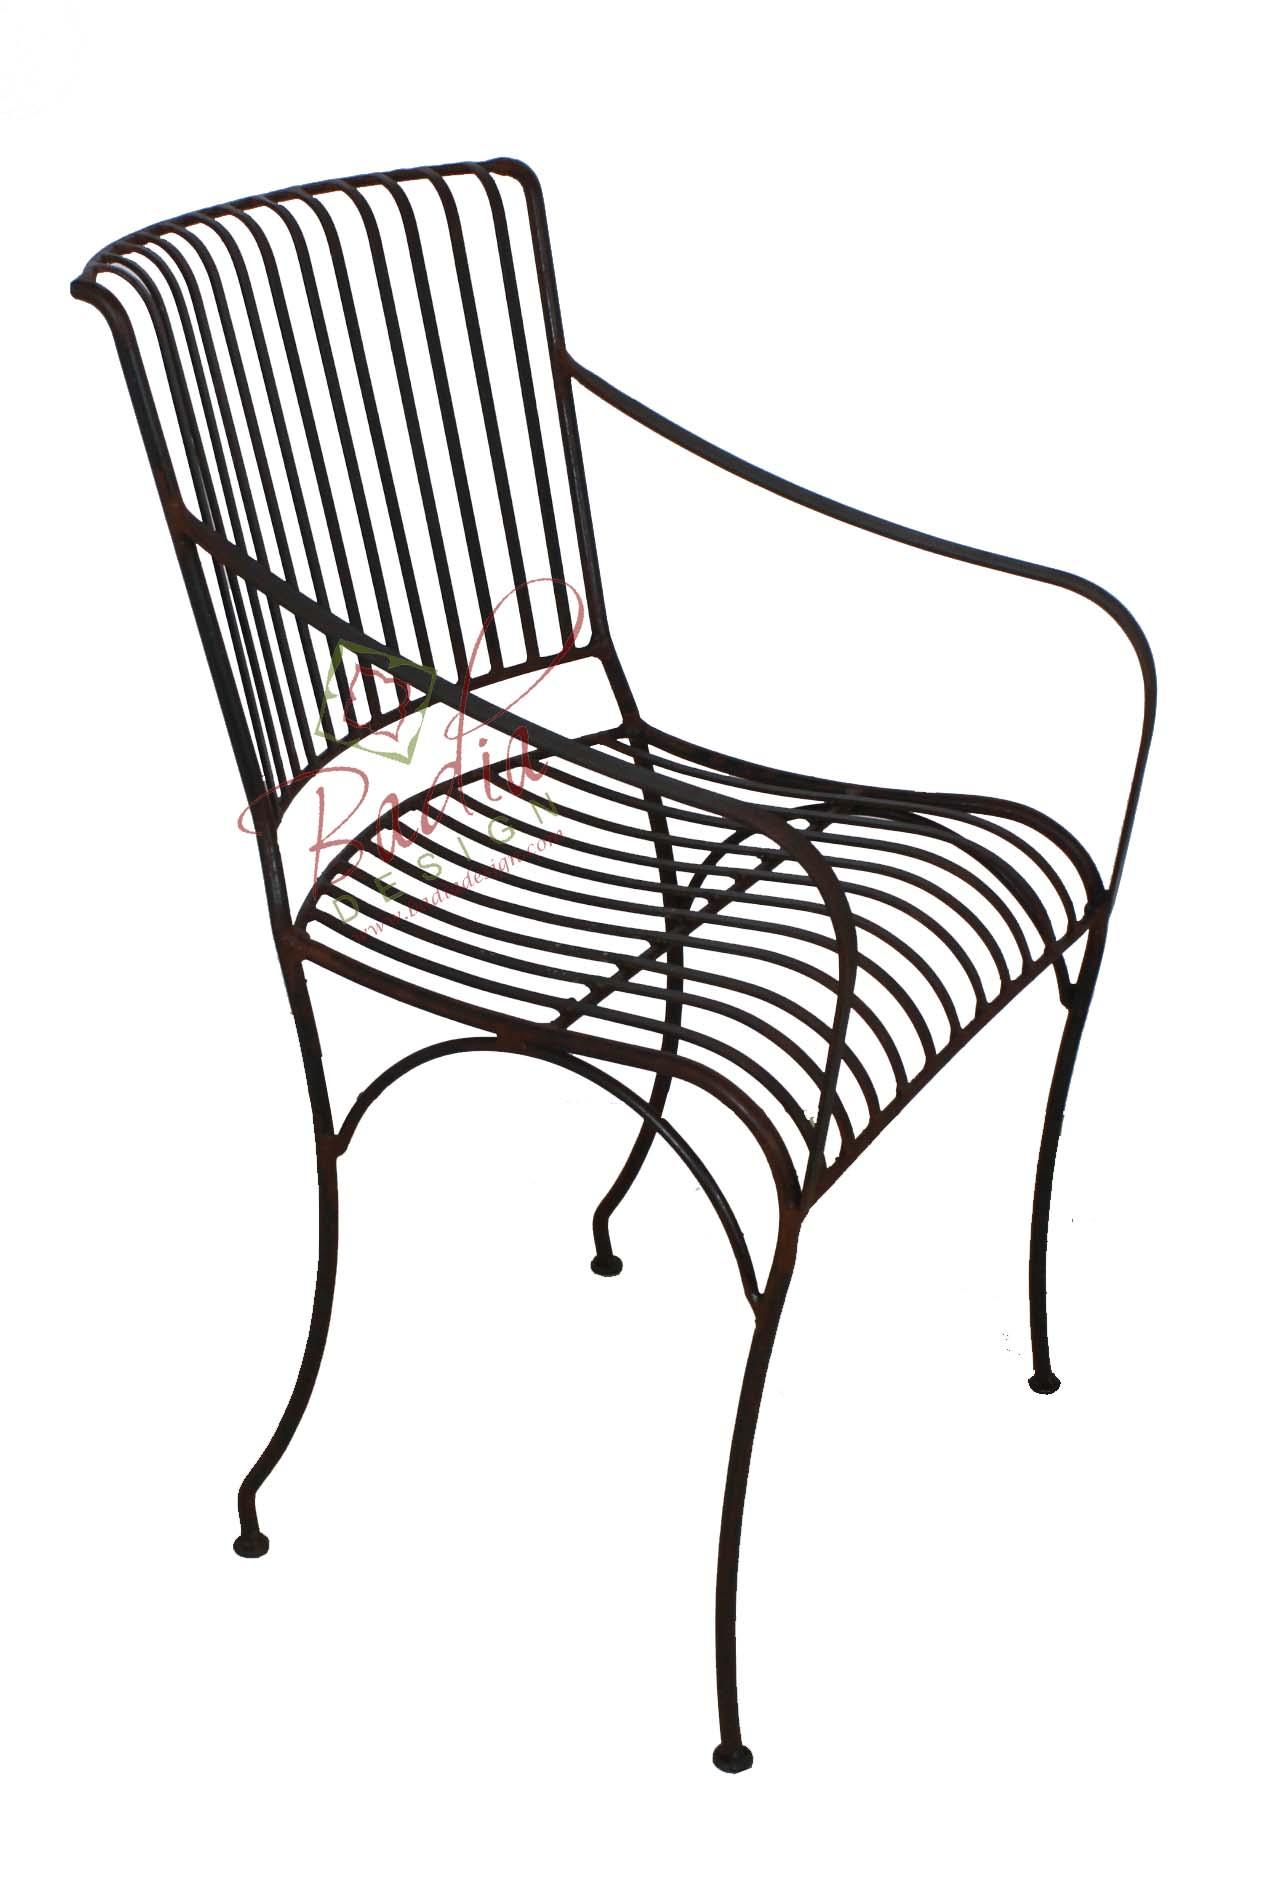 moroccan-outdoor-wrought-iron-furniture-ic029-2.jpg